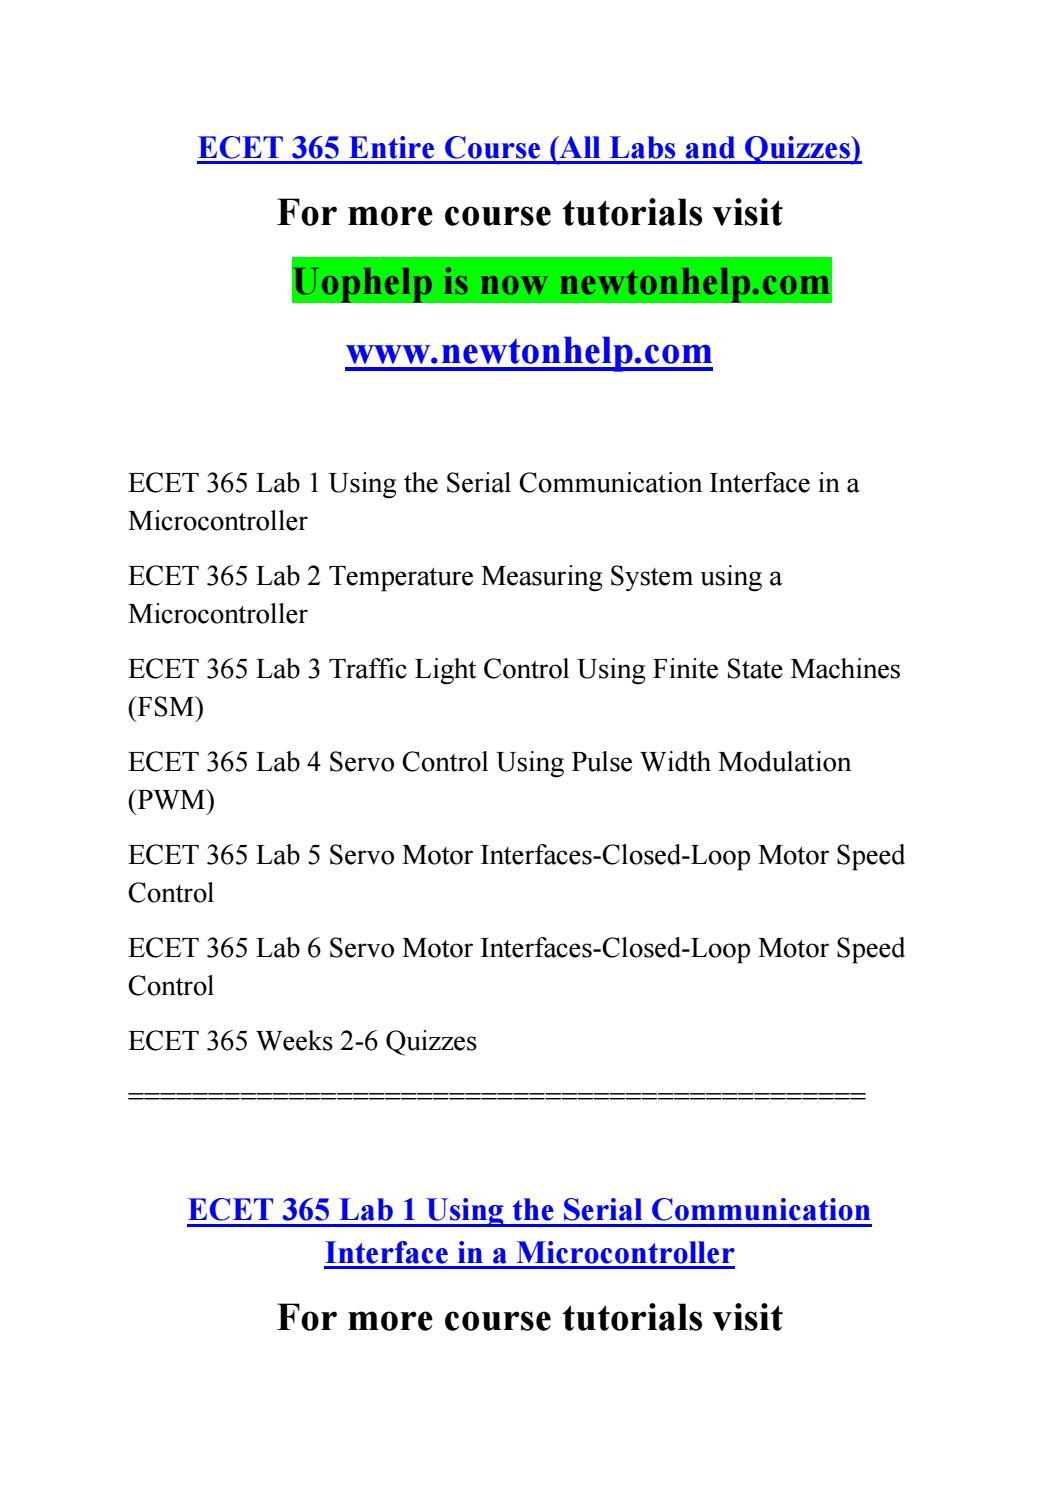 ECET 365 Seek Your Dream /newtonhelp com by thin kmorewor kless99